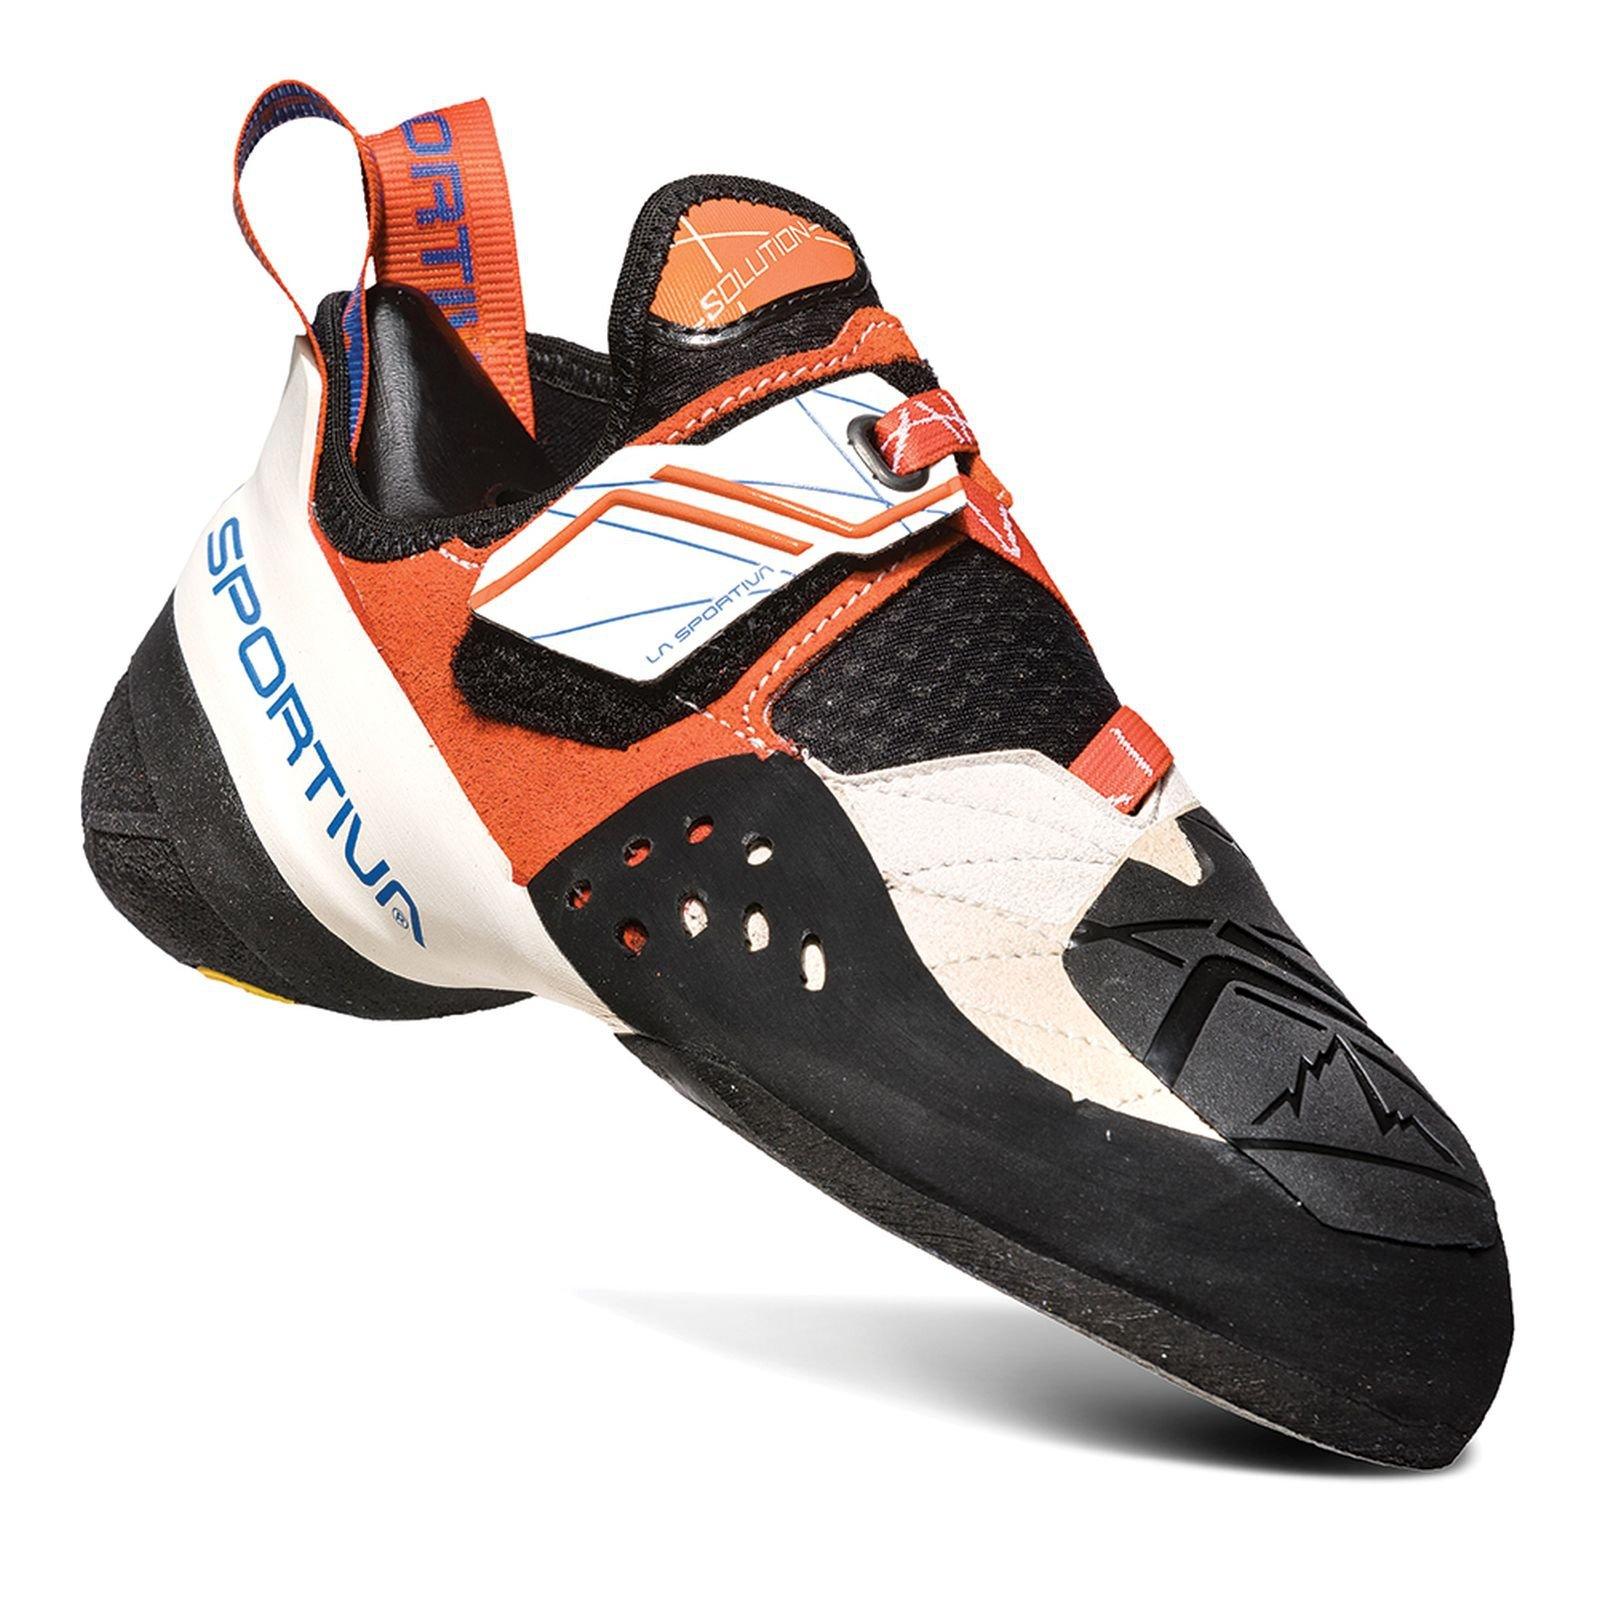 La Sportiva Women's Solution Performance Rock Climbing Shoe, White/LilyOrange, 38